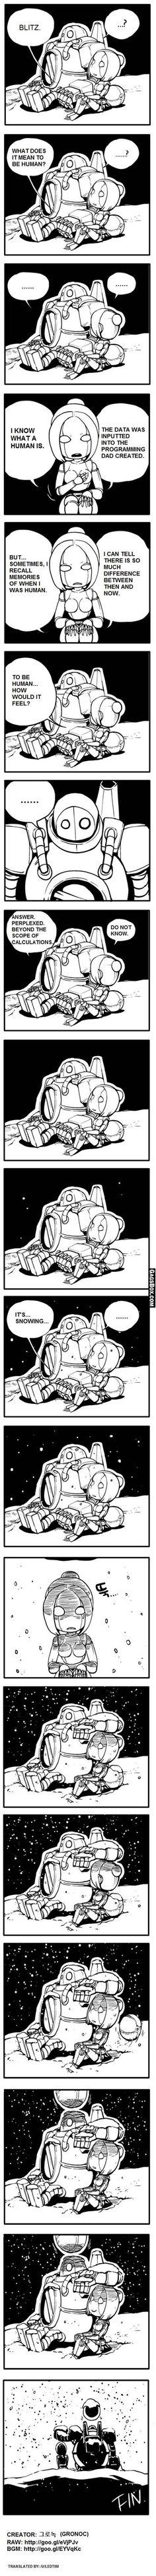 Being Human #comics